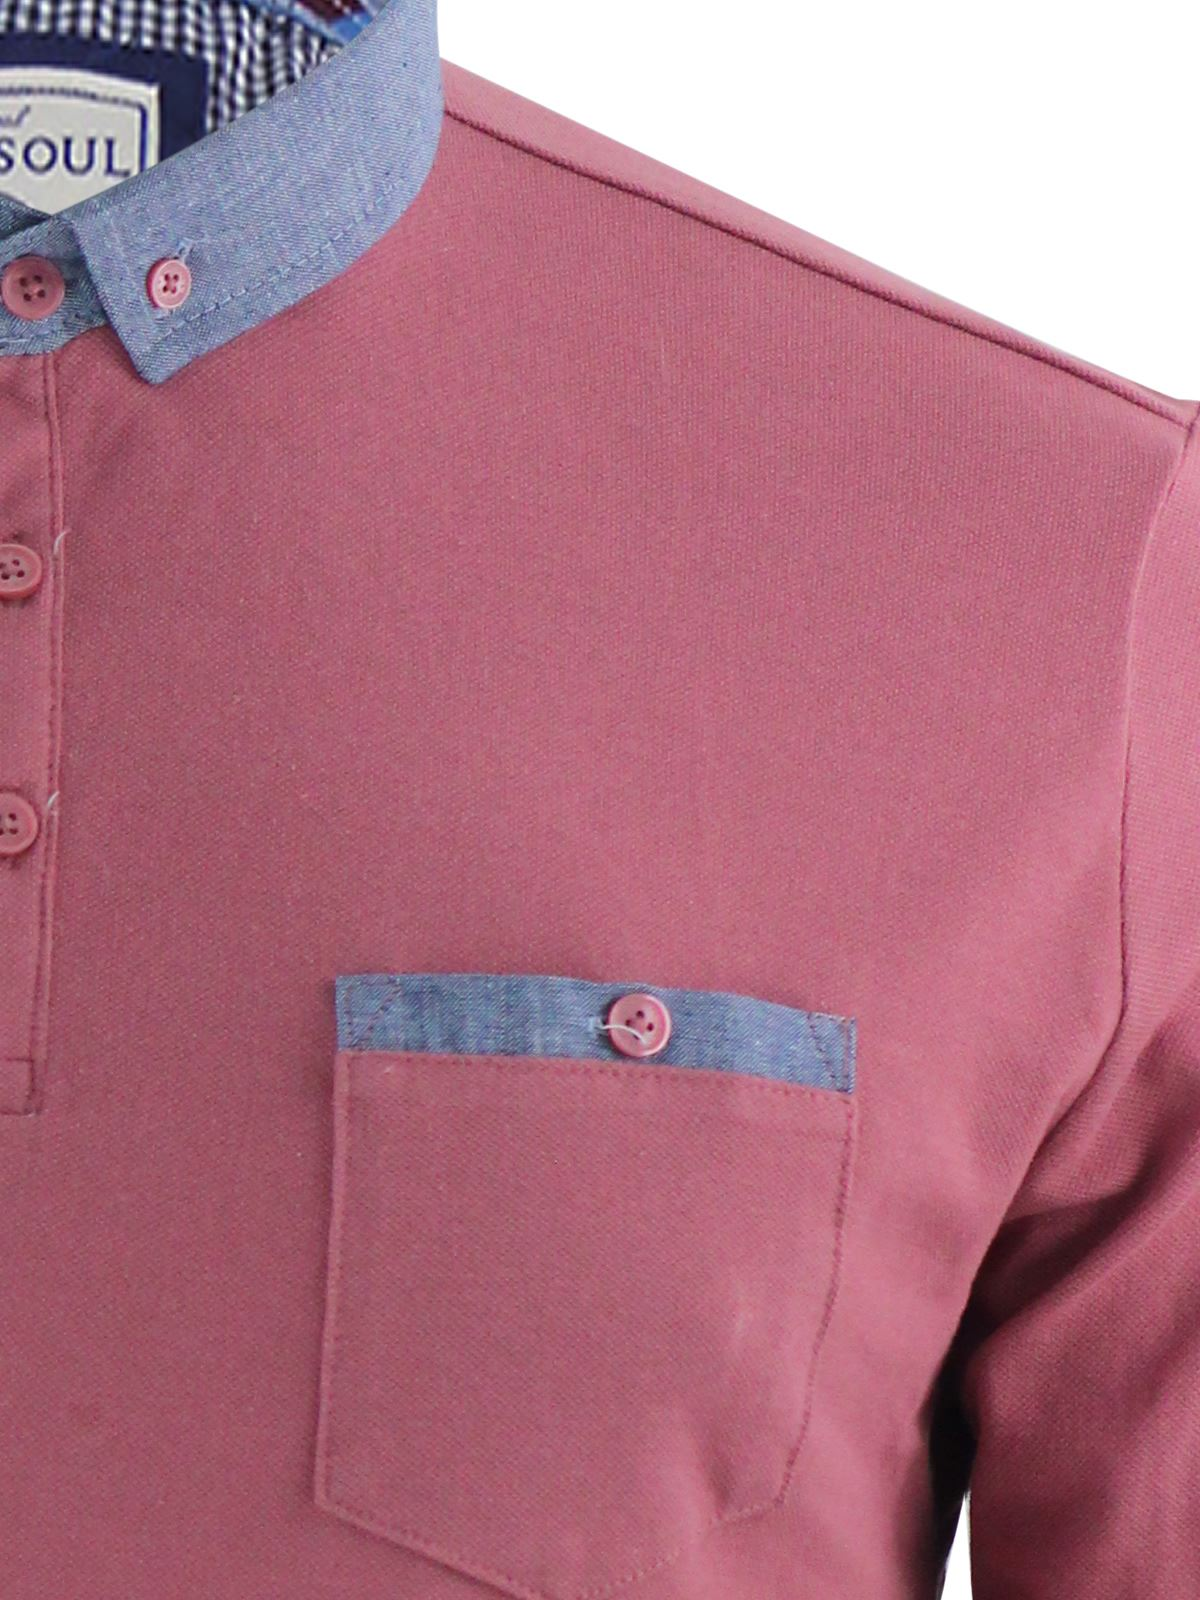 Para-Hombre-Polo-T-Shirt-Alma-valiente-Hera-Manga-Larga-De-Algodon-Casual-Top miniatura 13